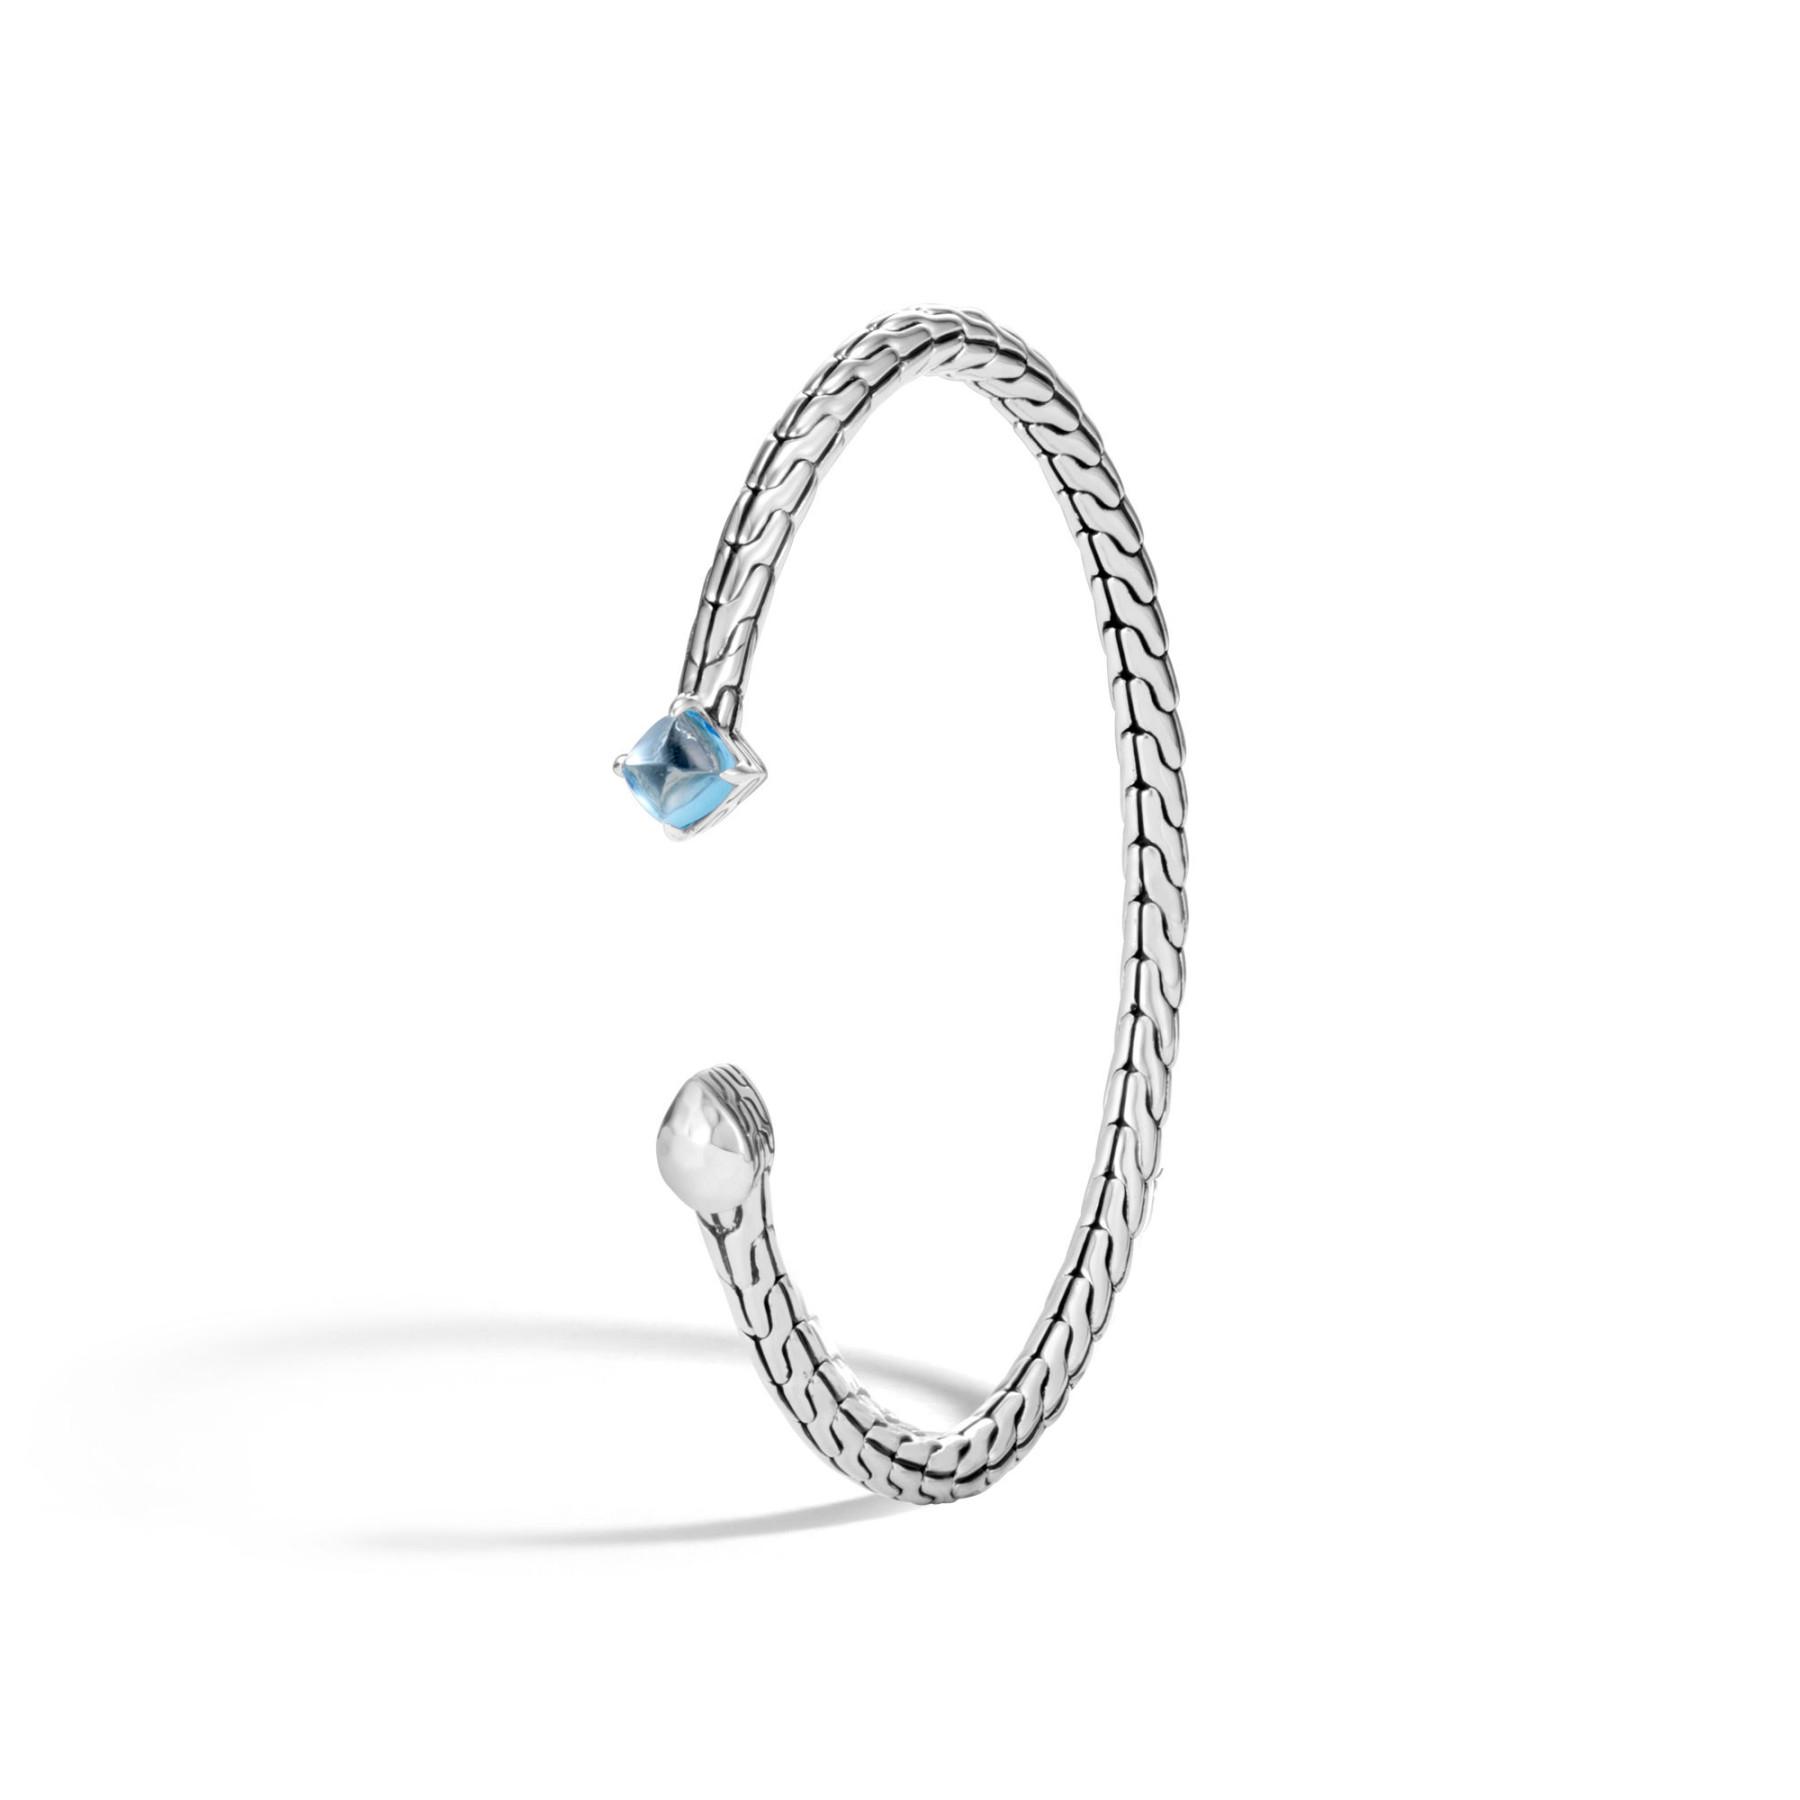 John Hardy Classic Chain Blue Topaz Cuff Bracelet angle view